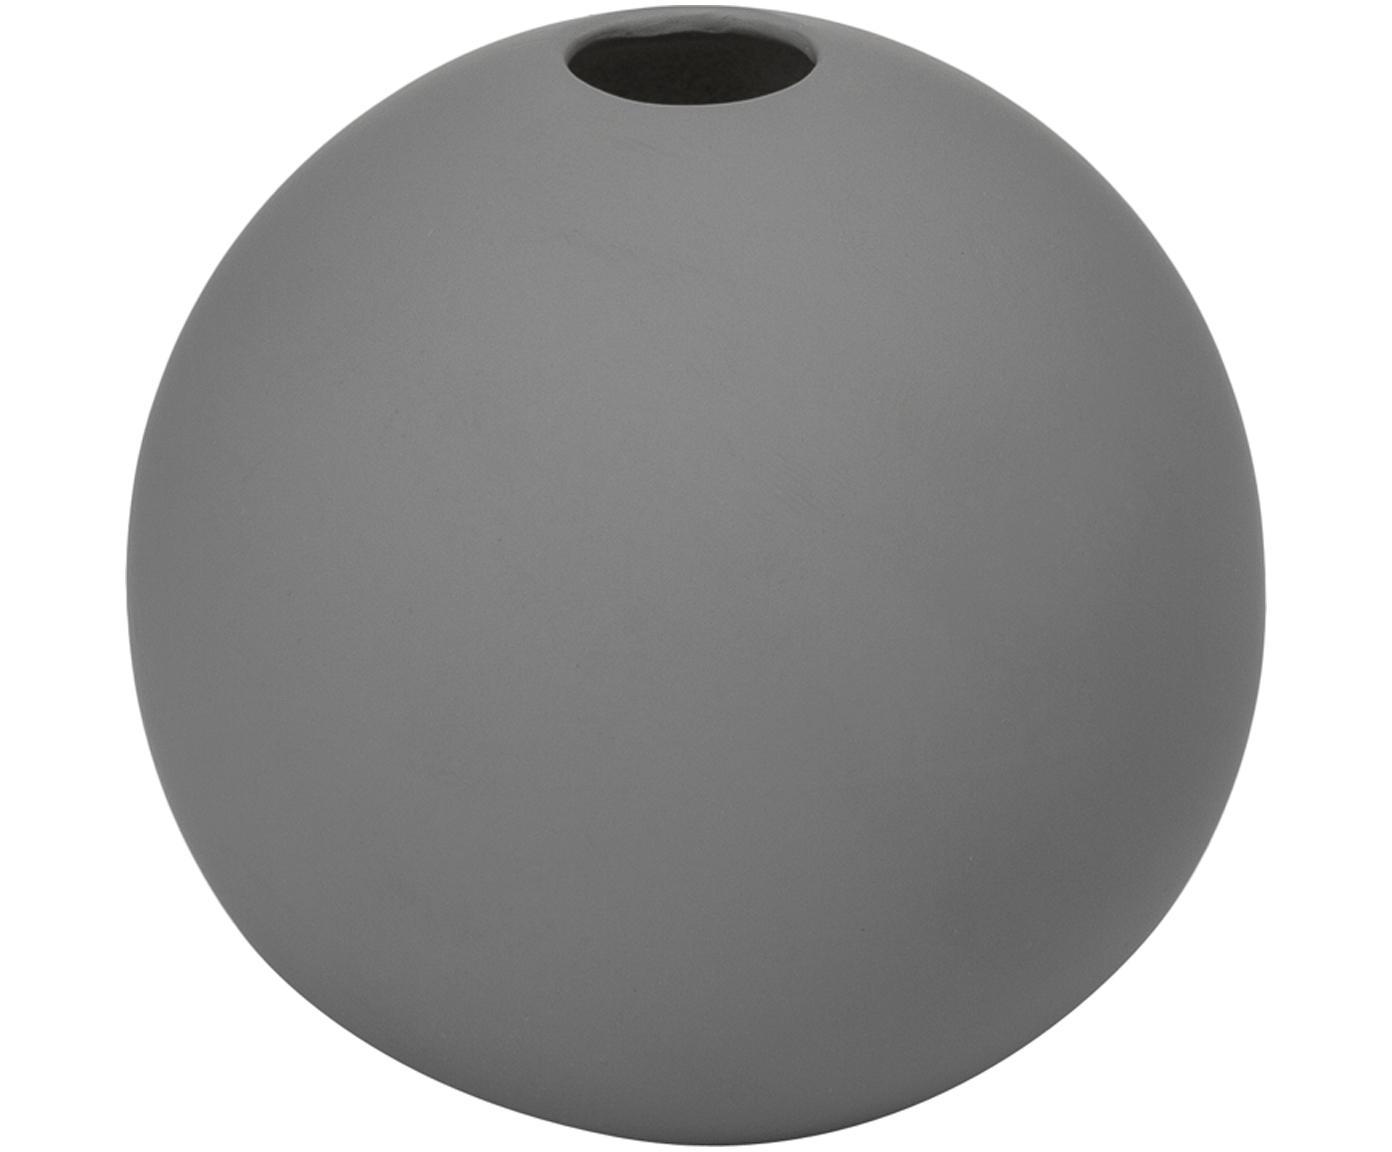 Jarrón artesanal Ball, Cerámica, Gris, Ø 8 x Al 8 cm